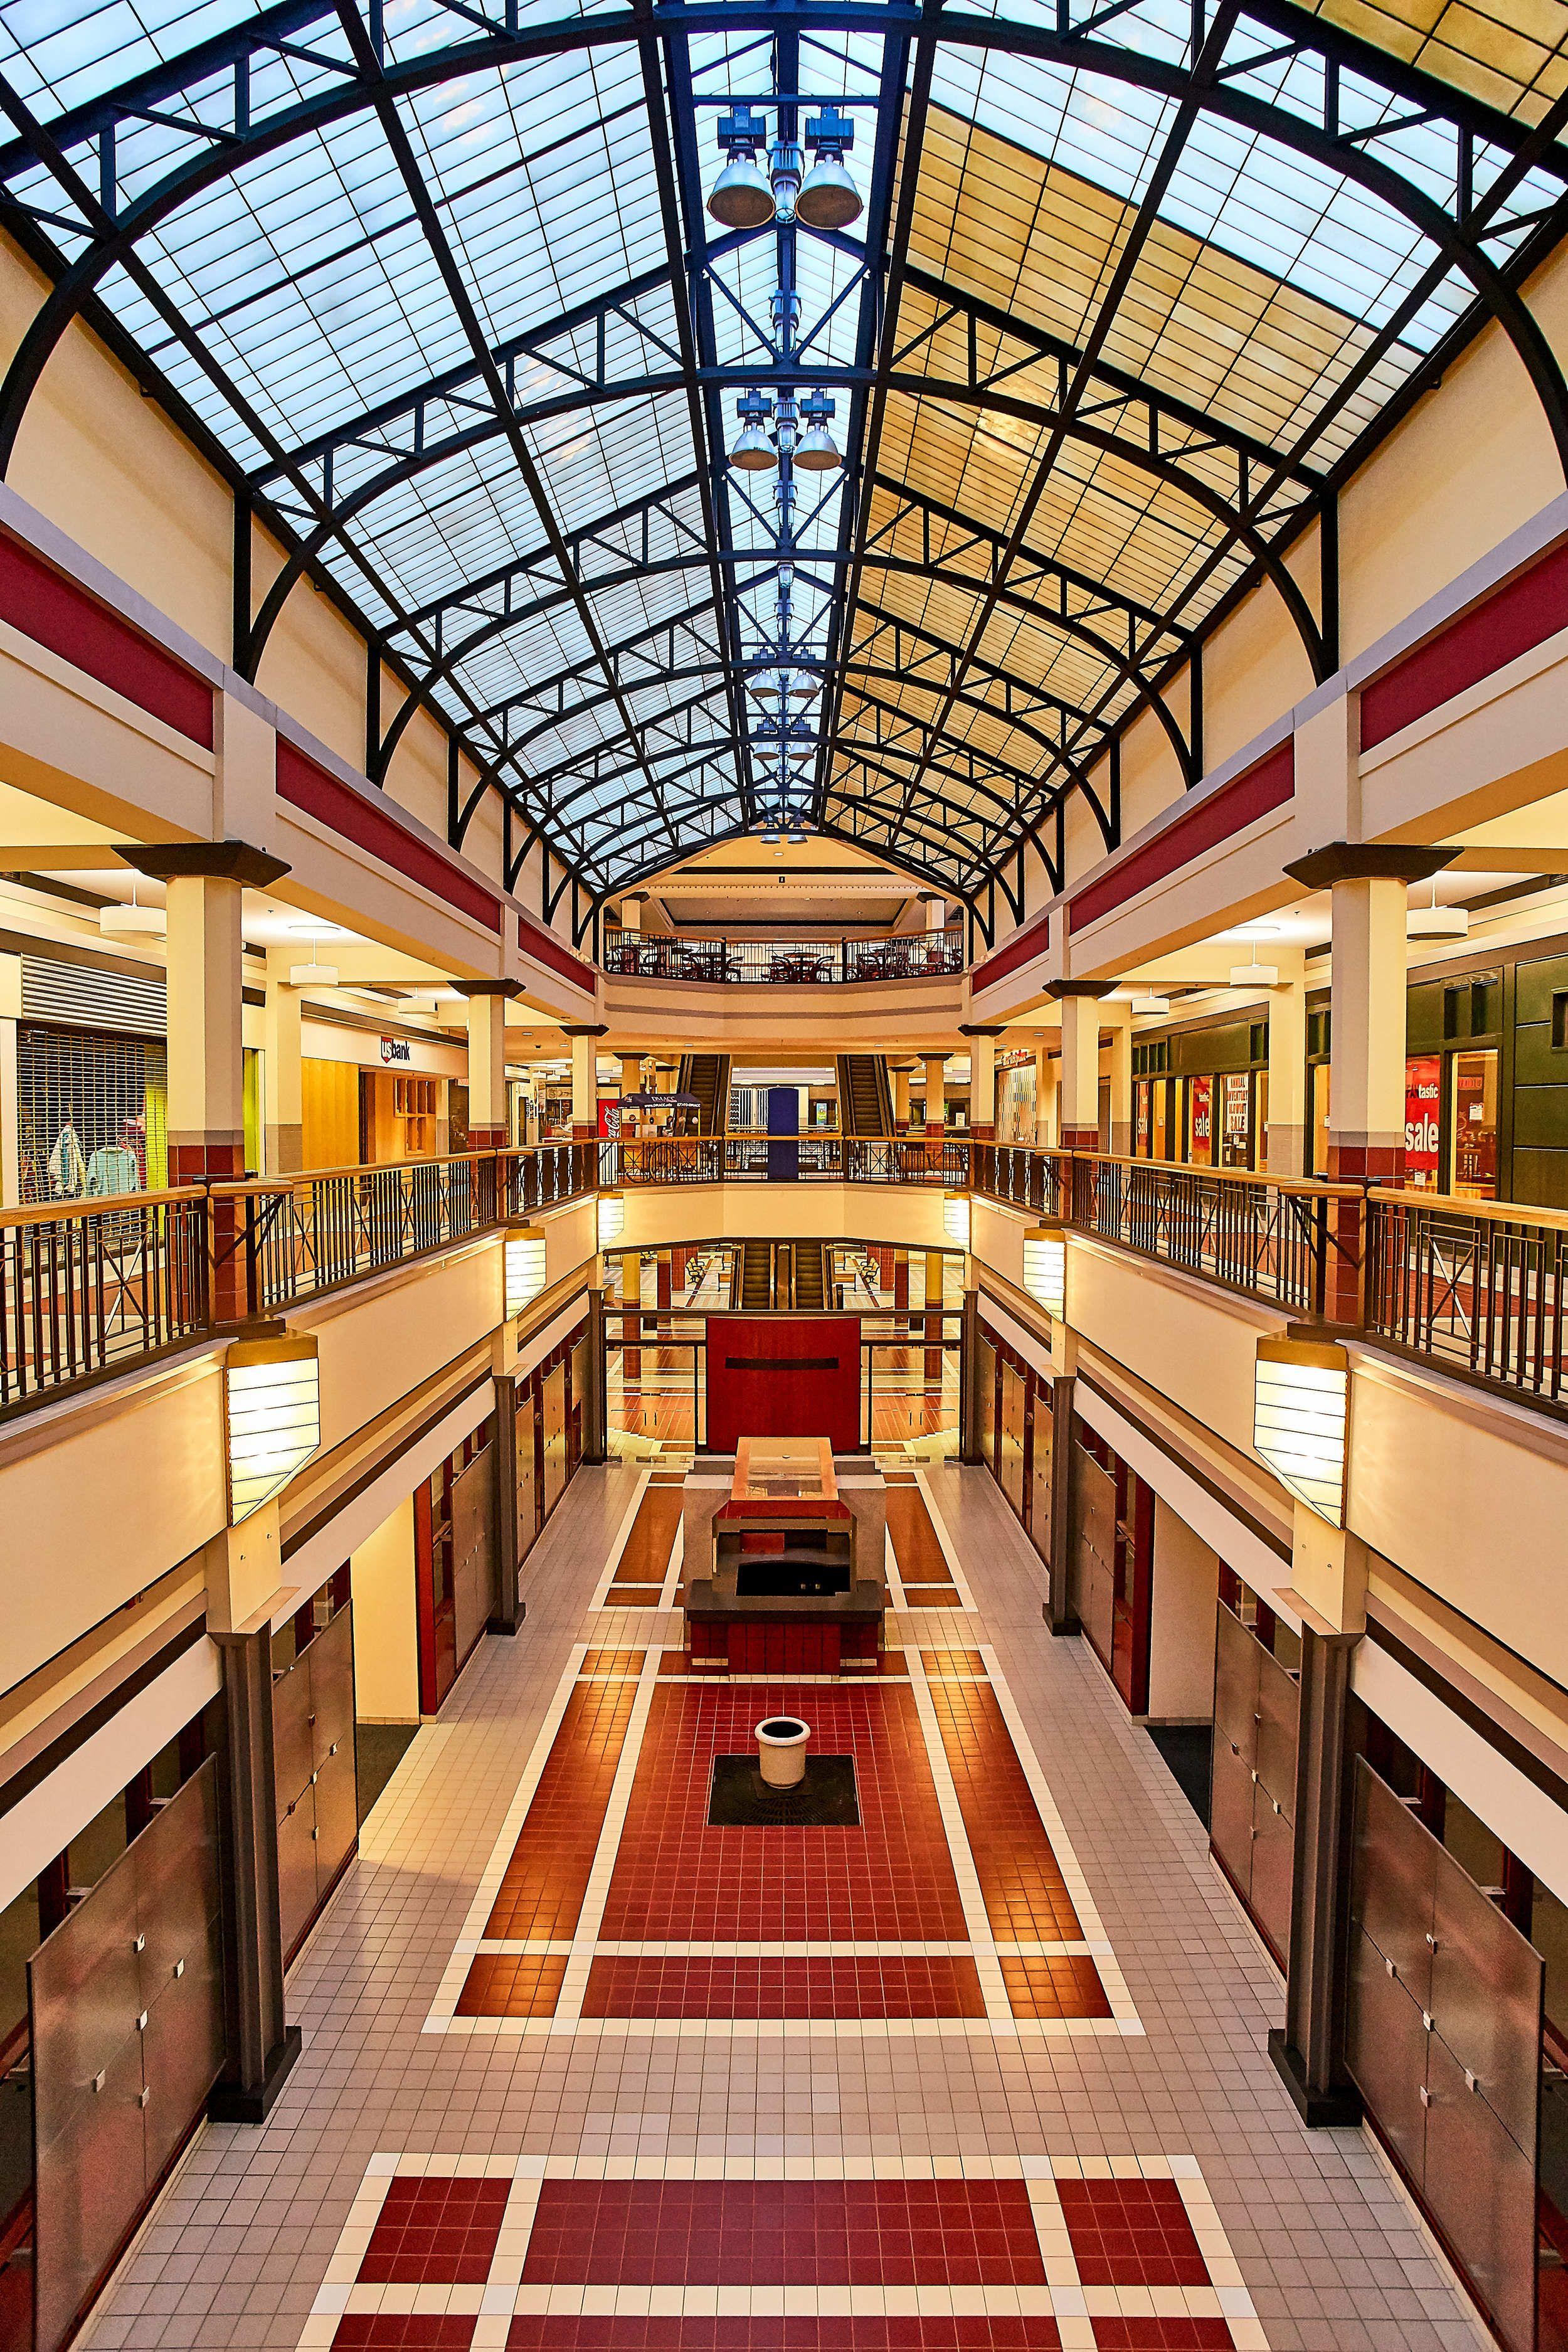 Kaleidoscope at The Hub downtown Des Moines skywalk — Jason Sturges